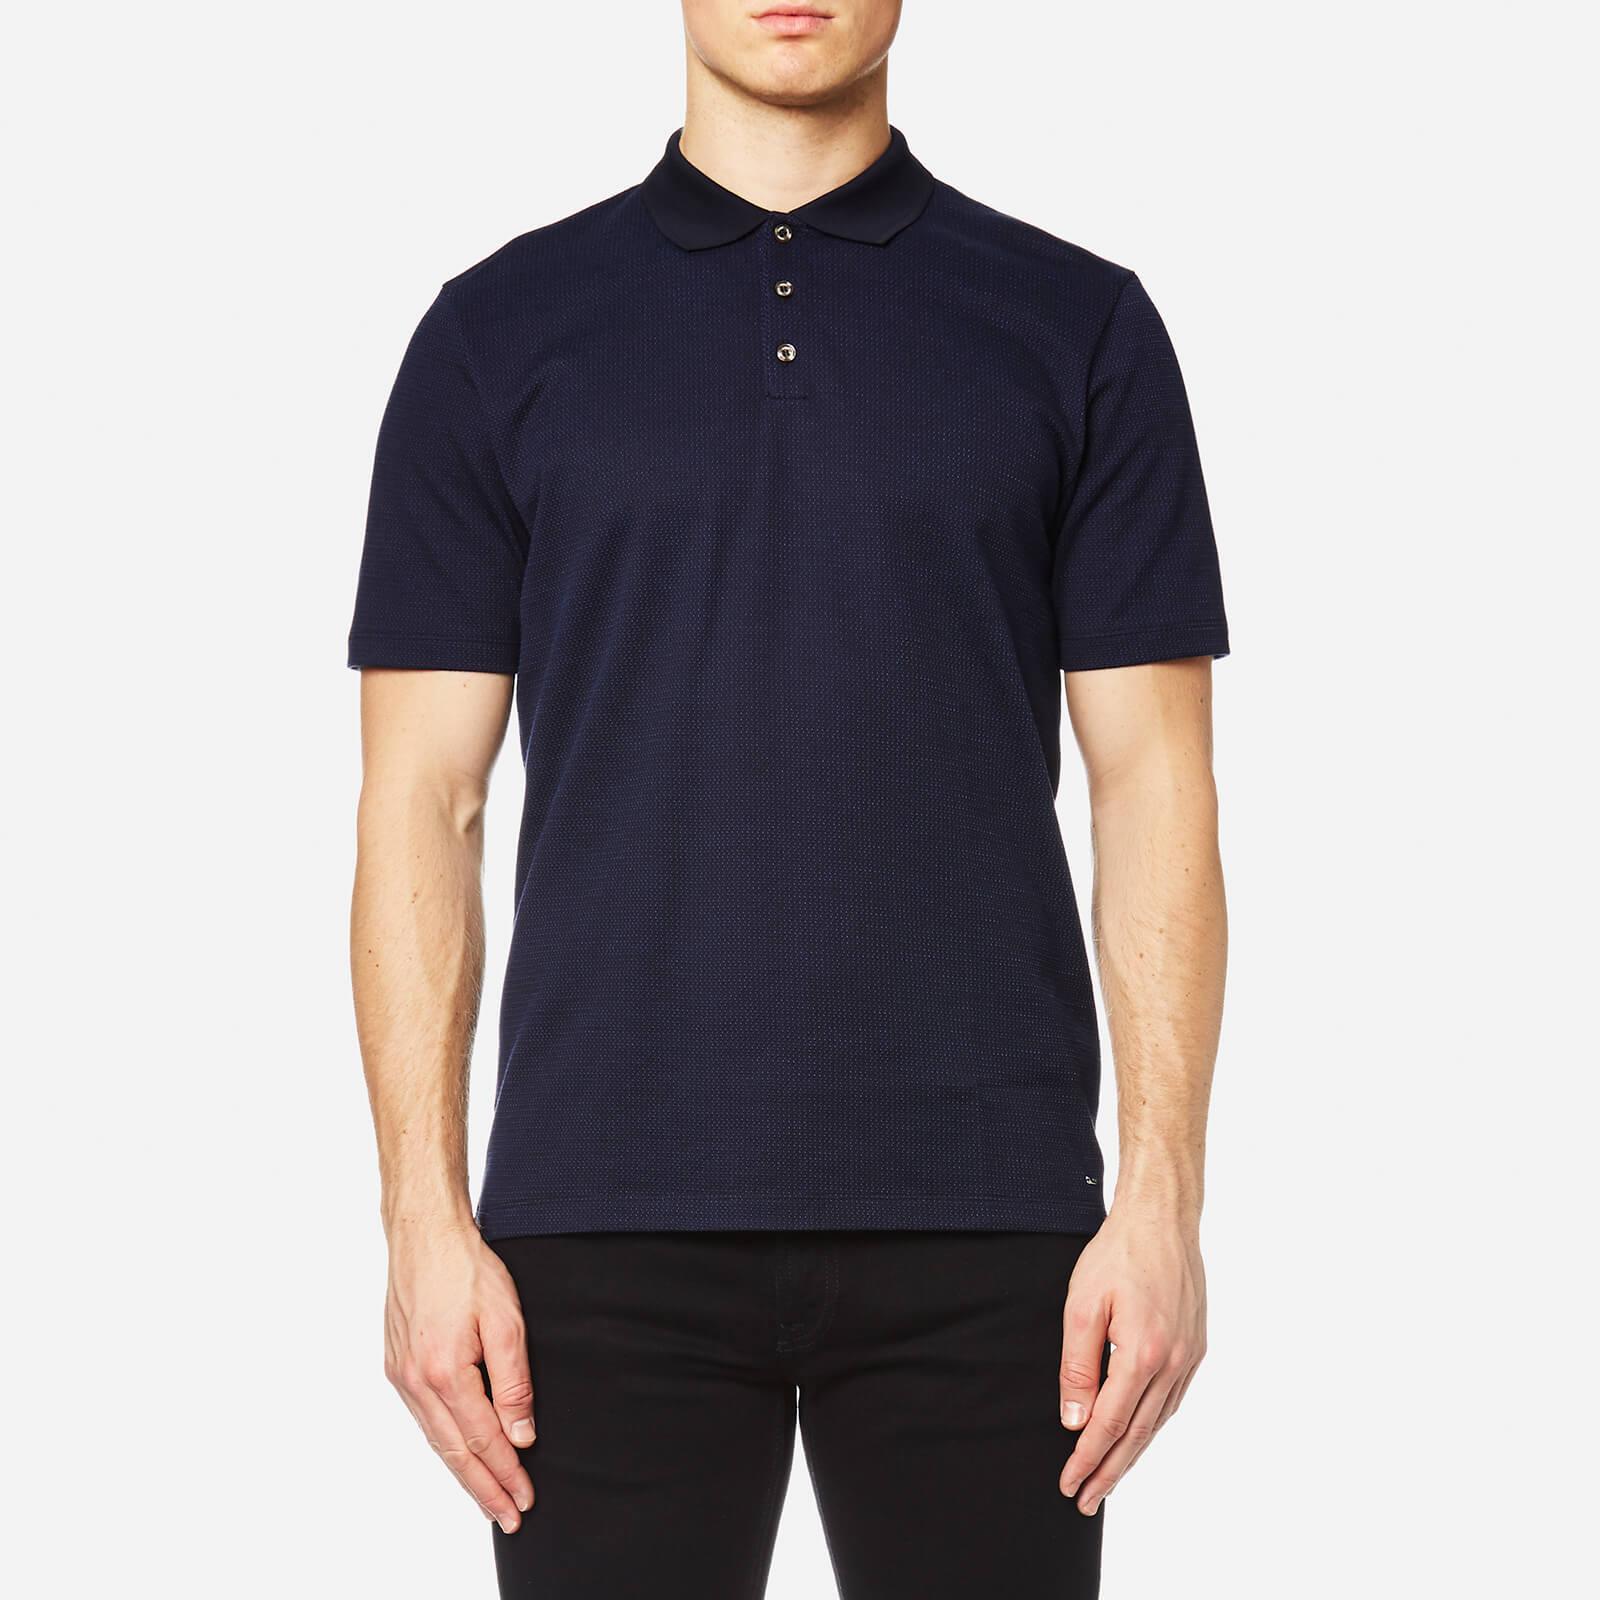 Hugo Boss Men's Dateno Textured Polo Shirt - Navy - S - Blue